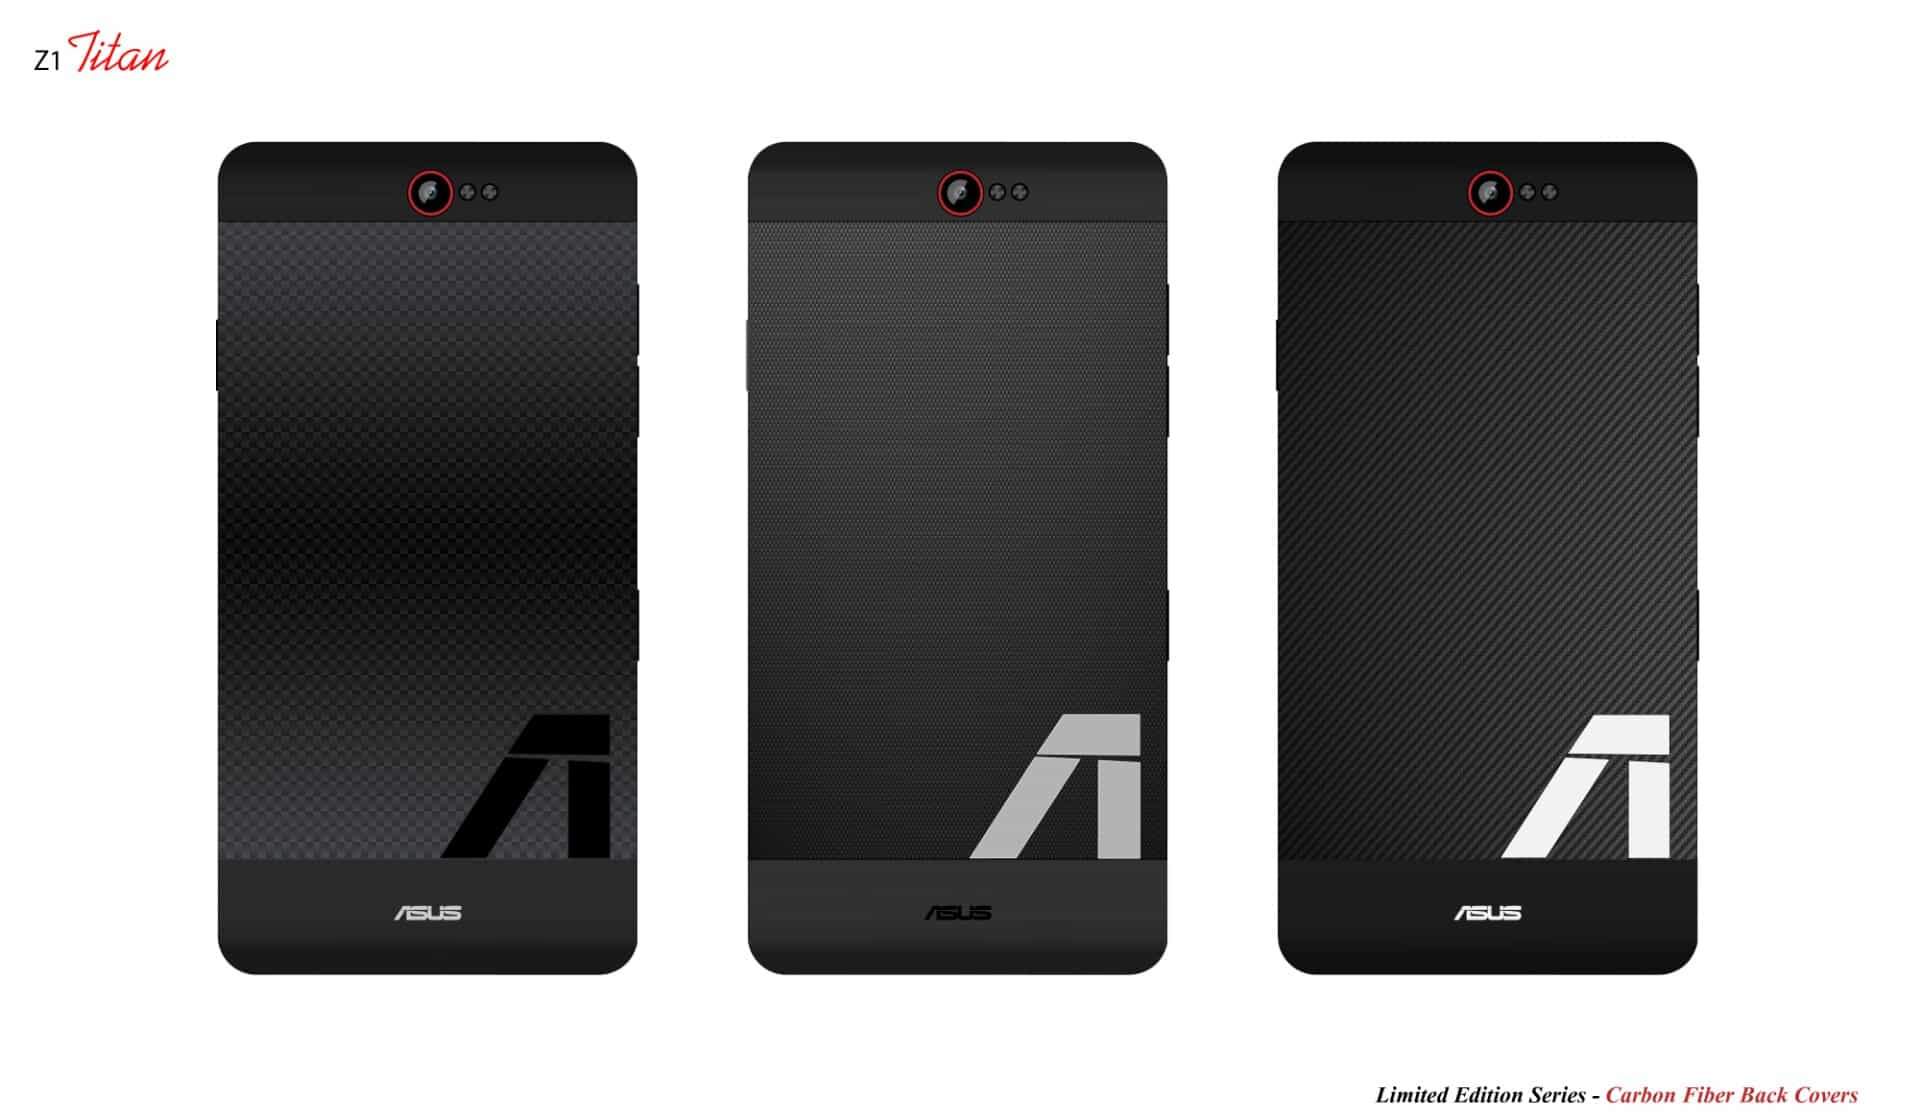 Asus Z1 Titan concept 6